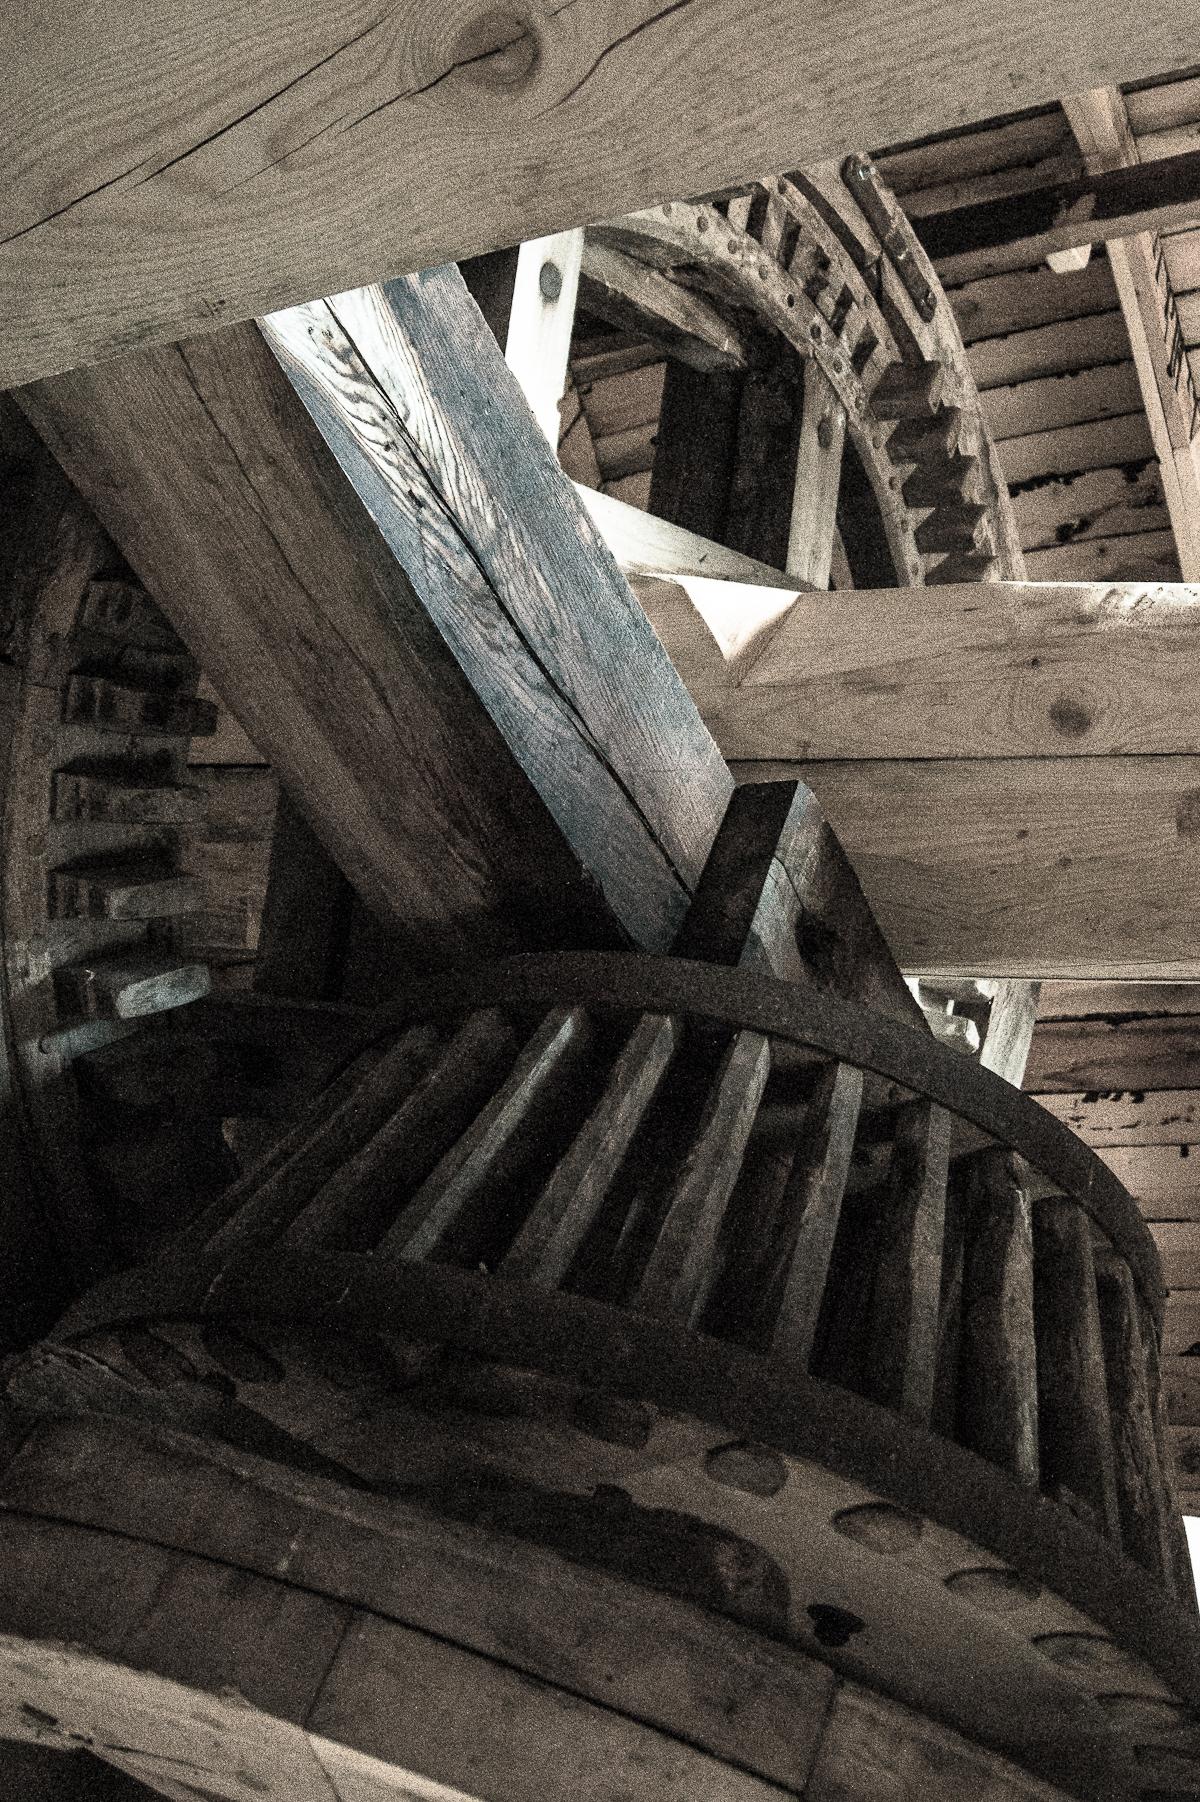 Wooden Gears Via @Atisgailis